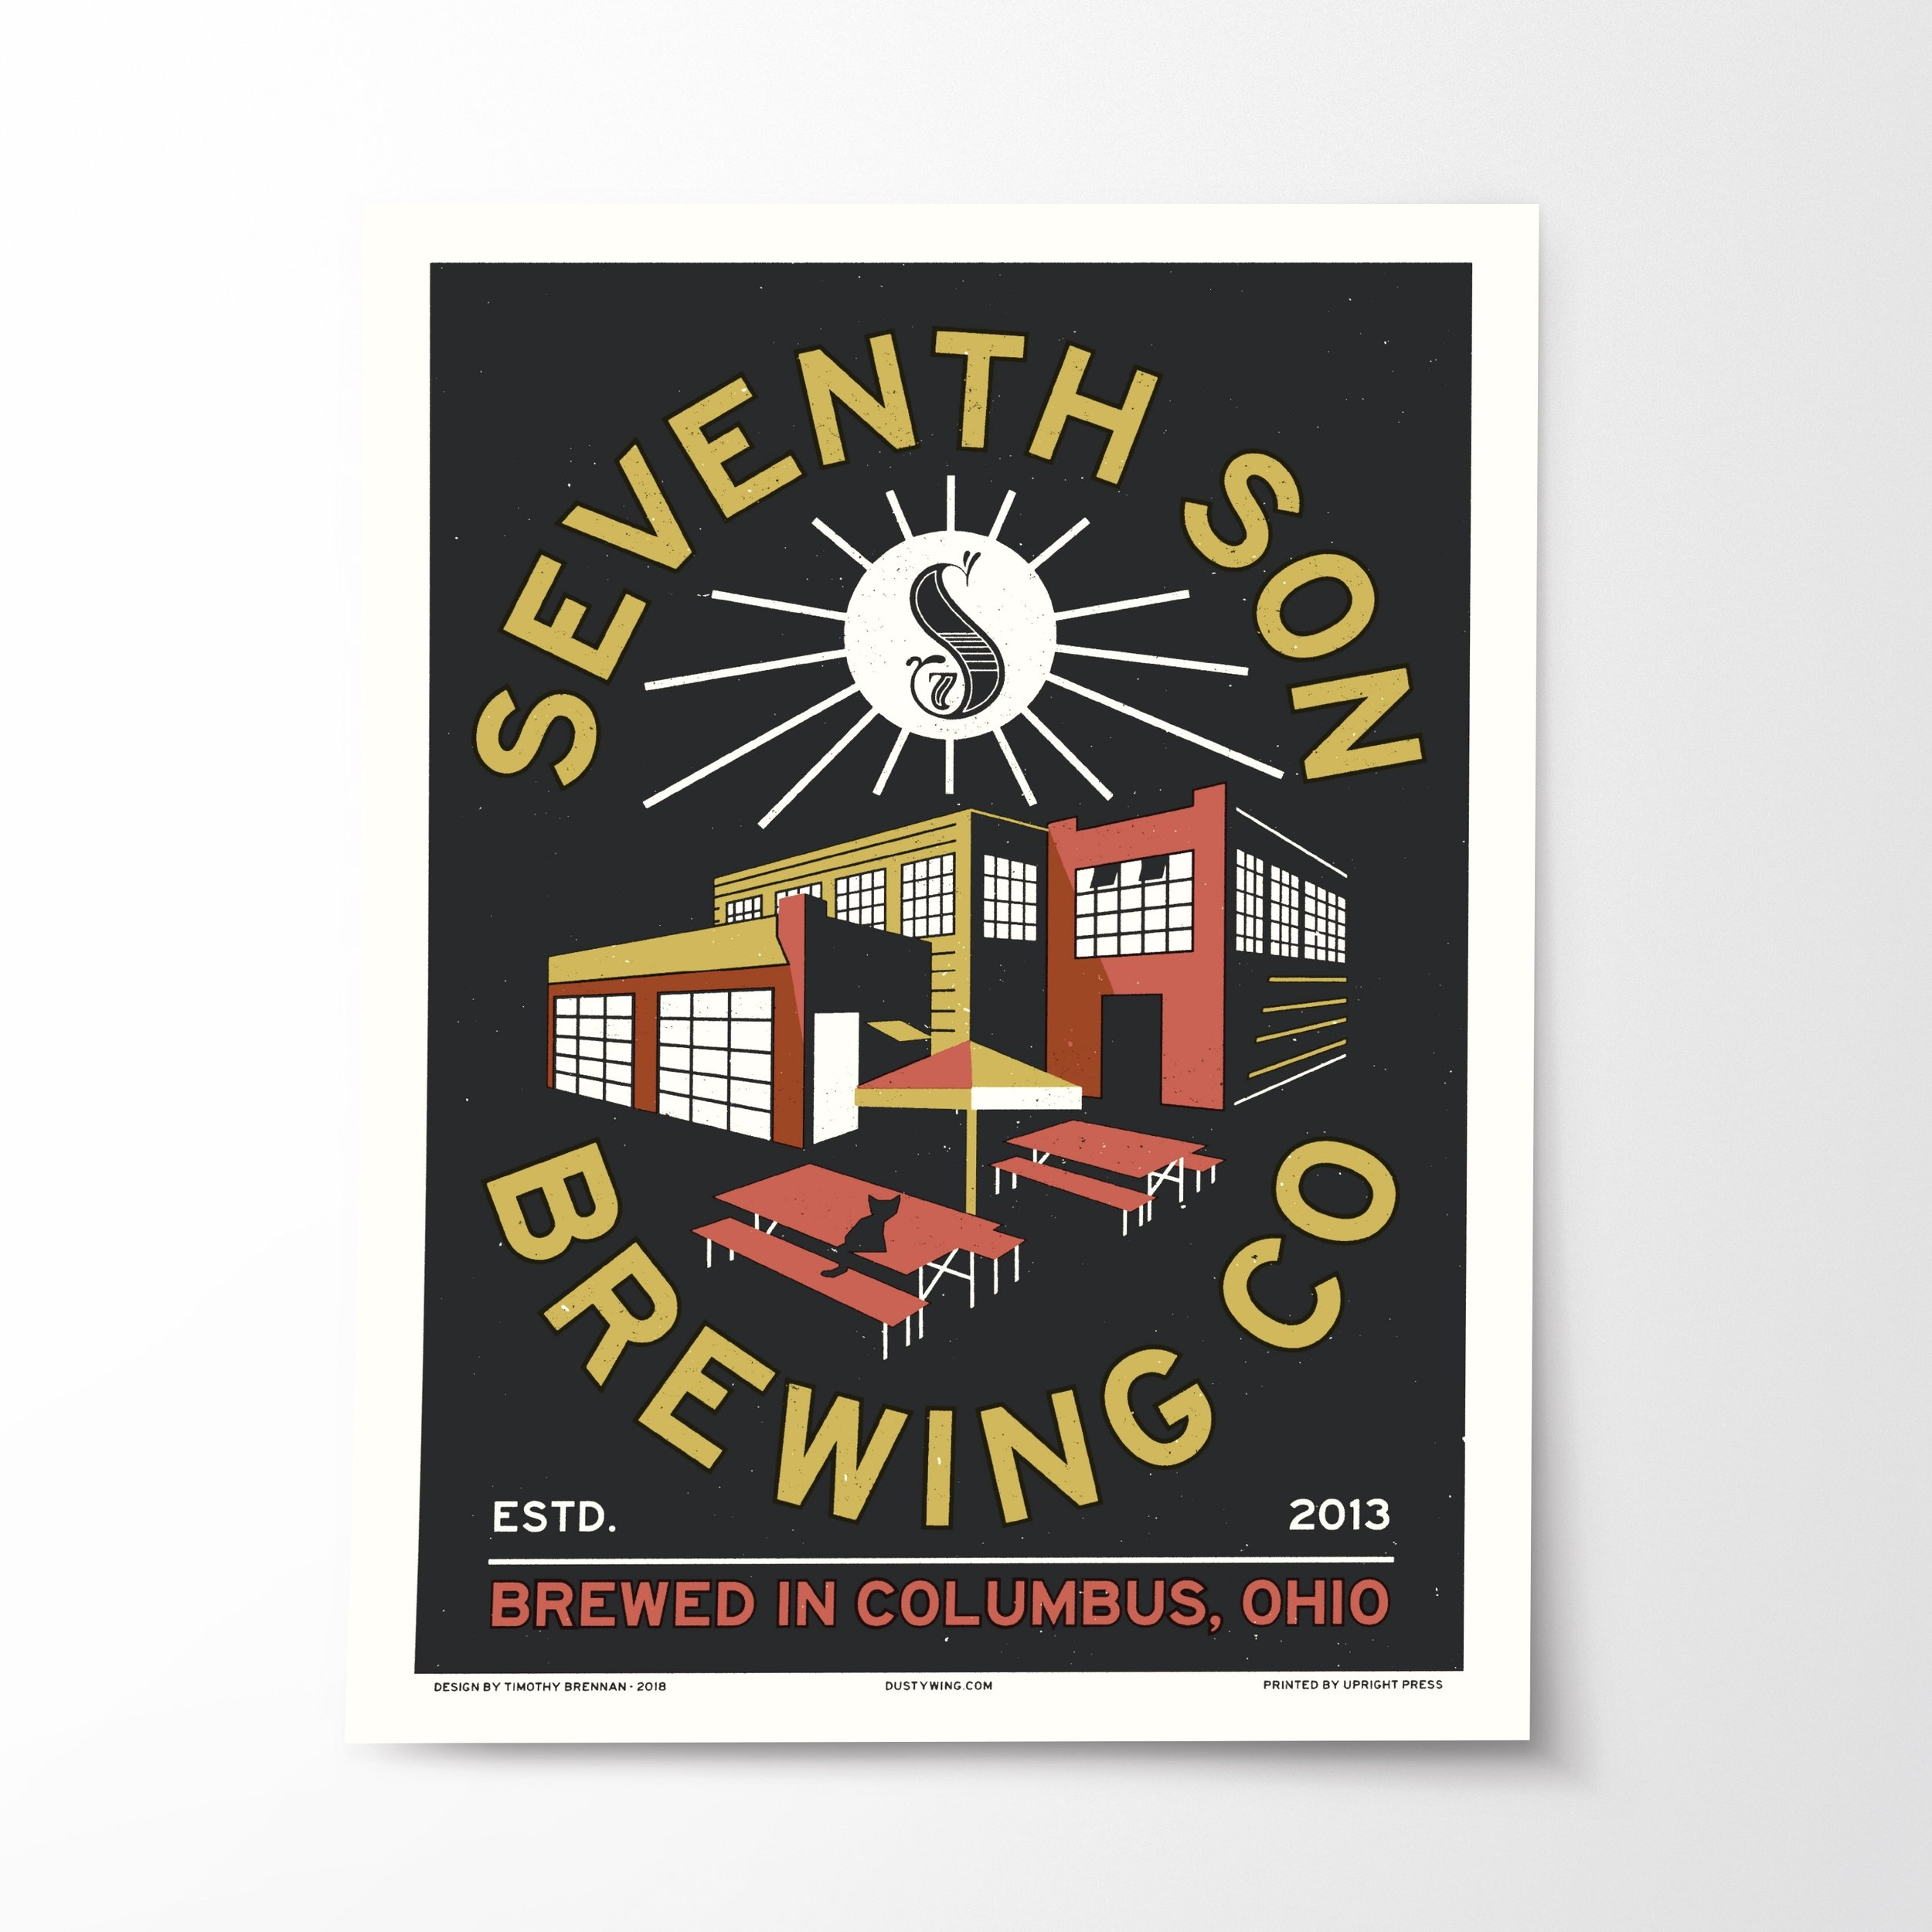 TB_Seventh Son Brewing_Poster_1.jpg